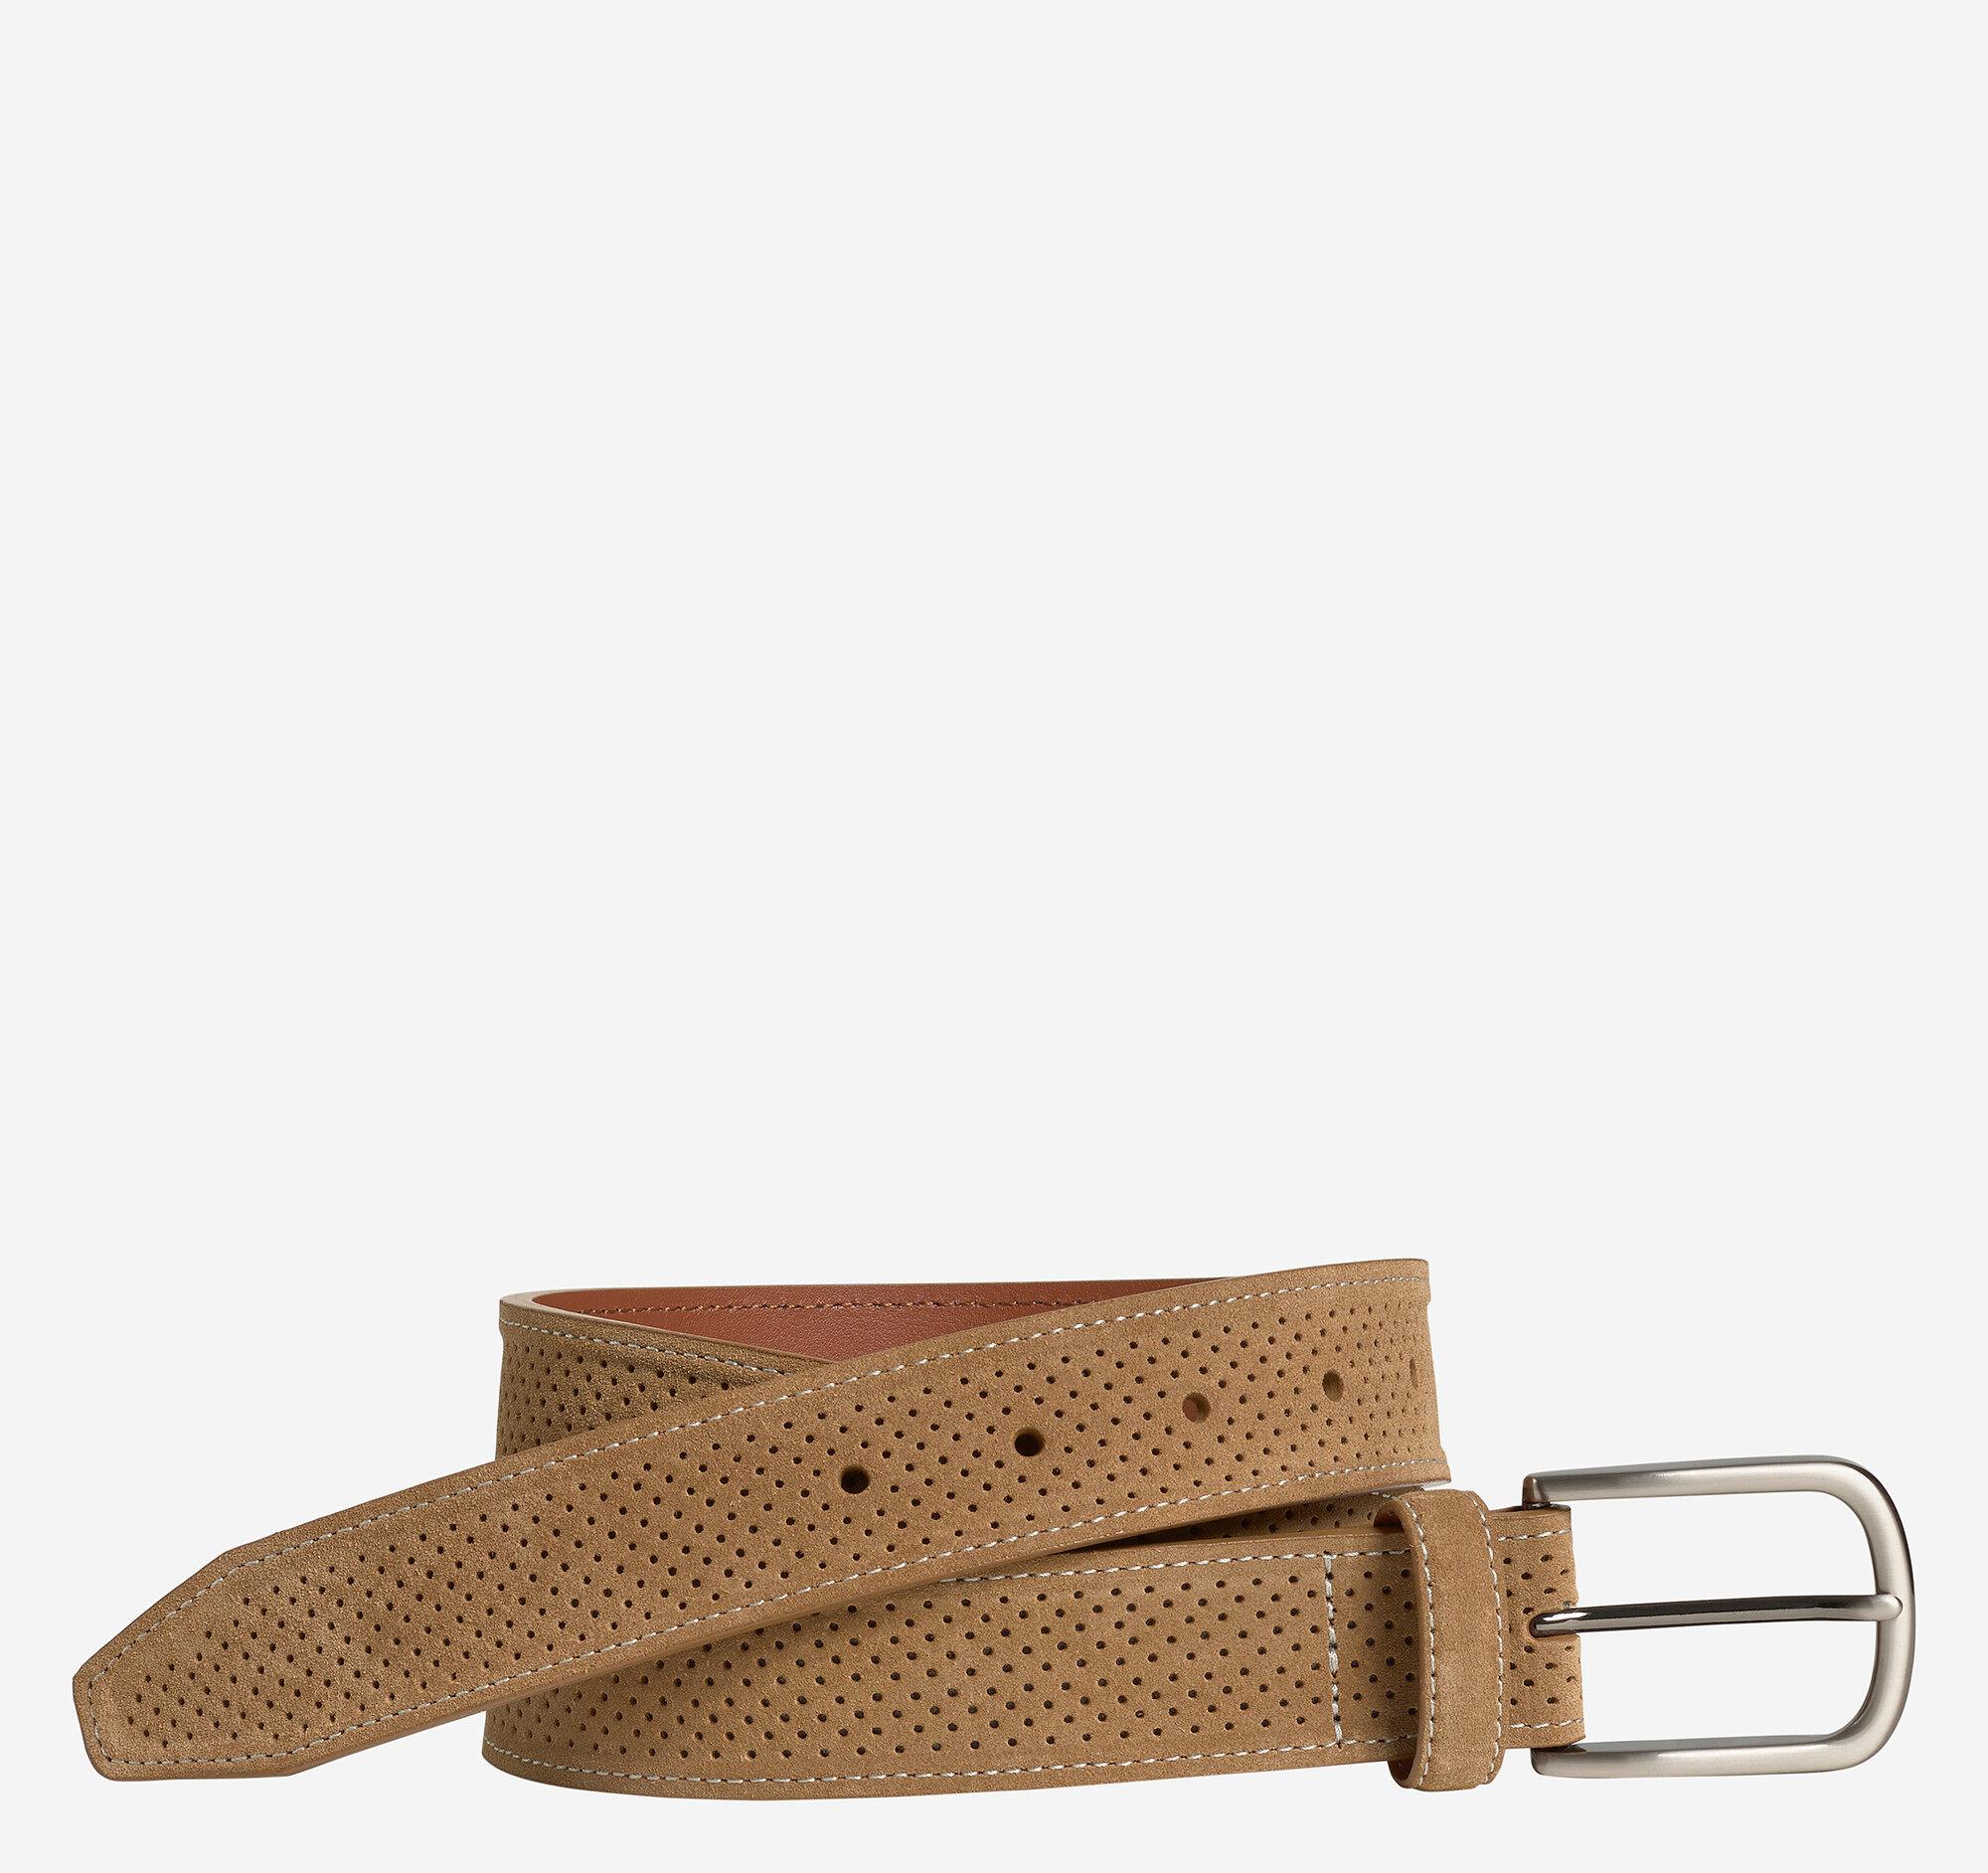 Johnston & Murphy Men's Suede Perf Belt - Tan Suede Leather - Size 44